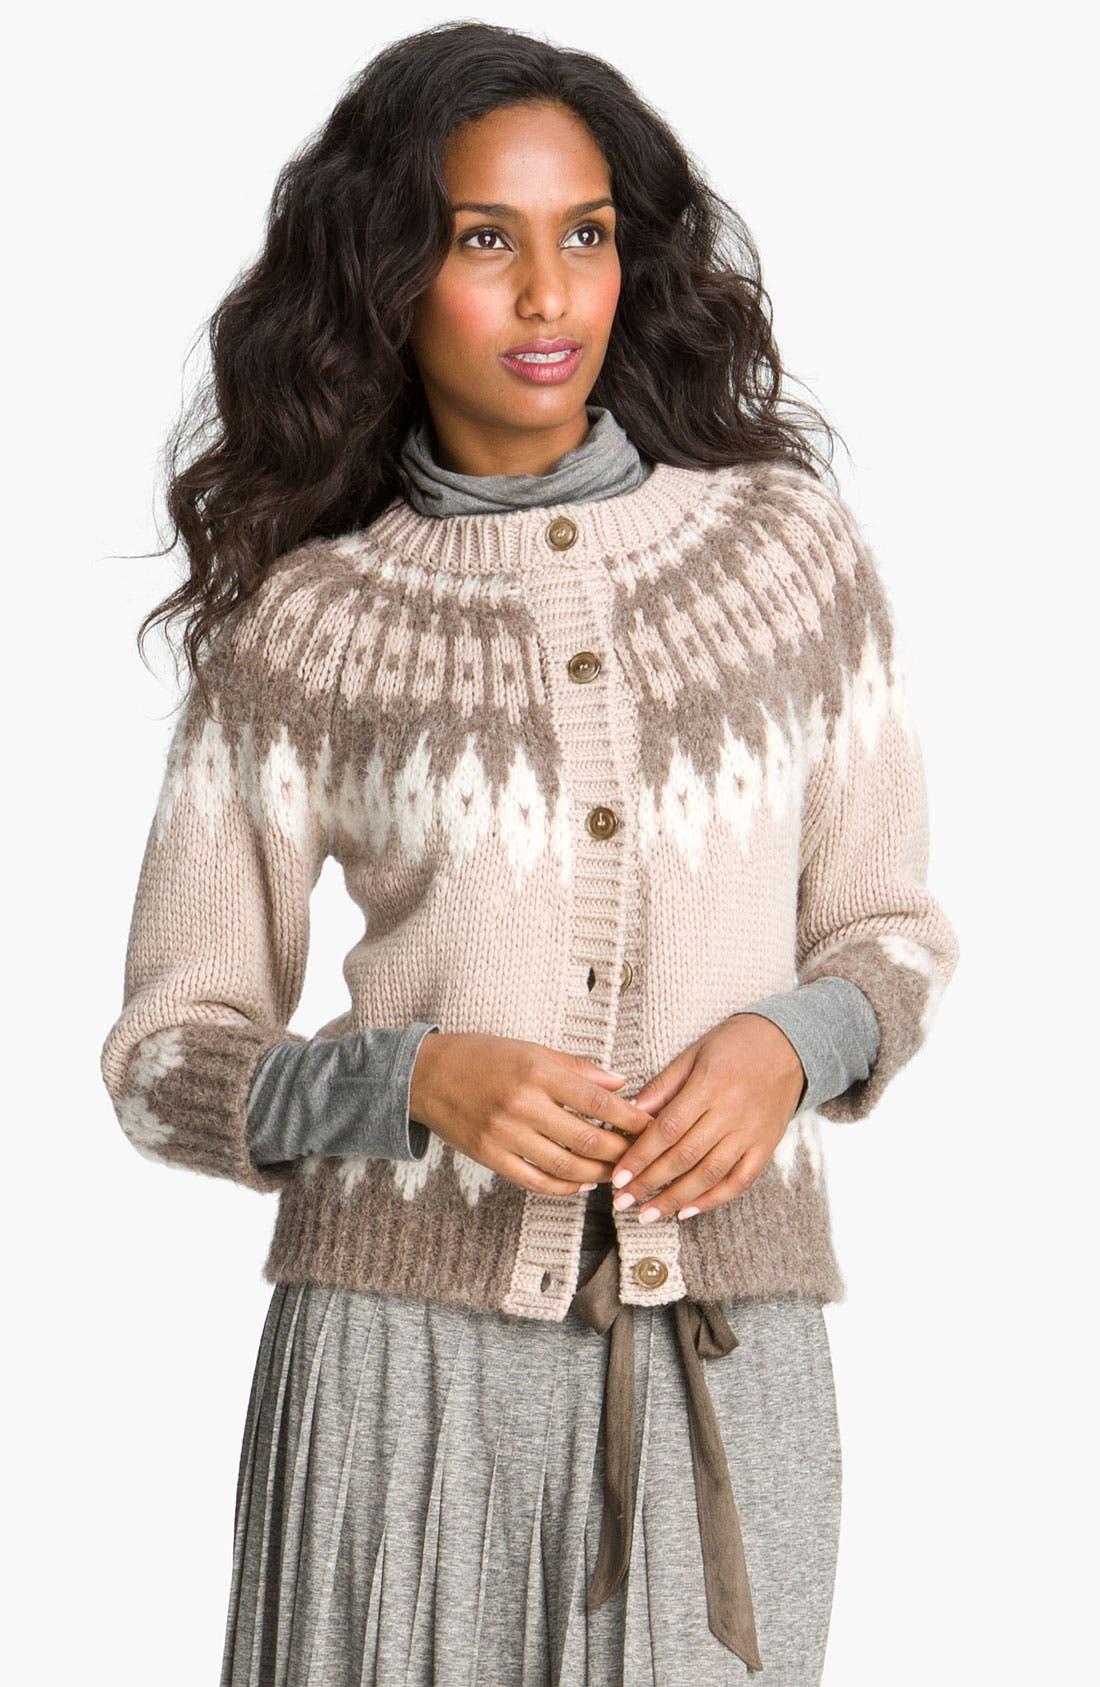 Alternate Image 1 Selected - Weekend Max Mara 'Brenta' Sweater